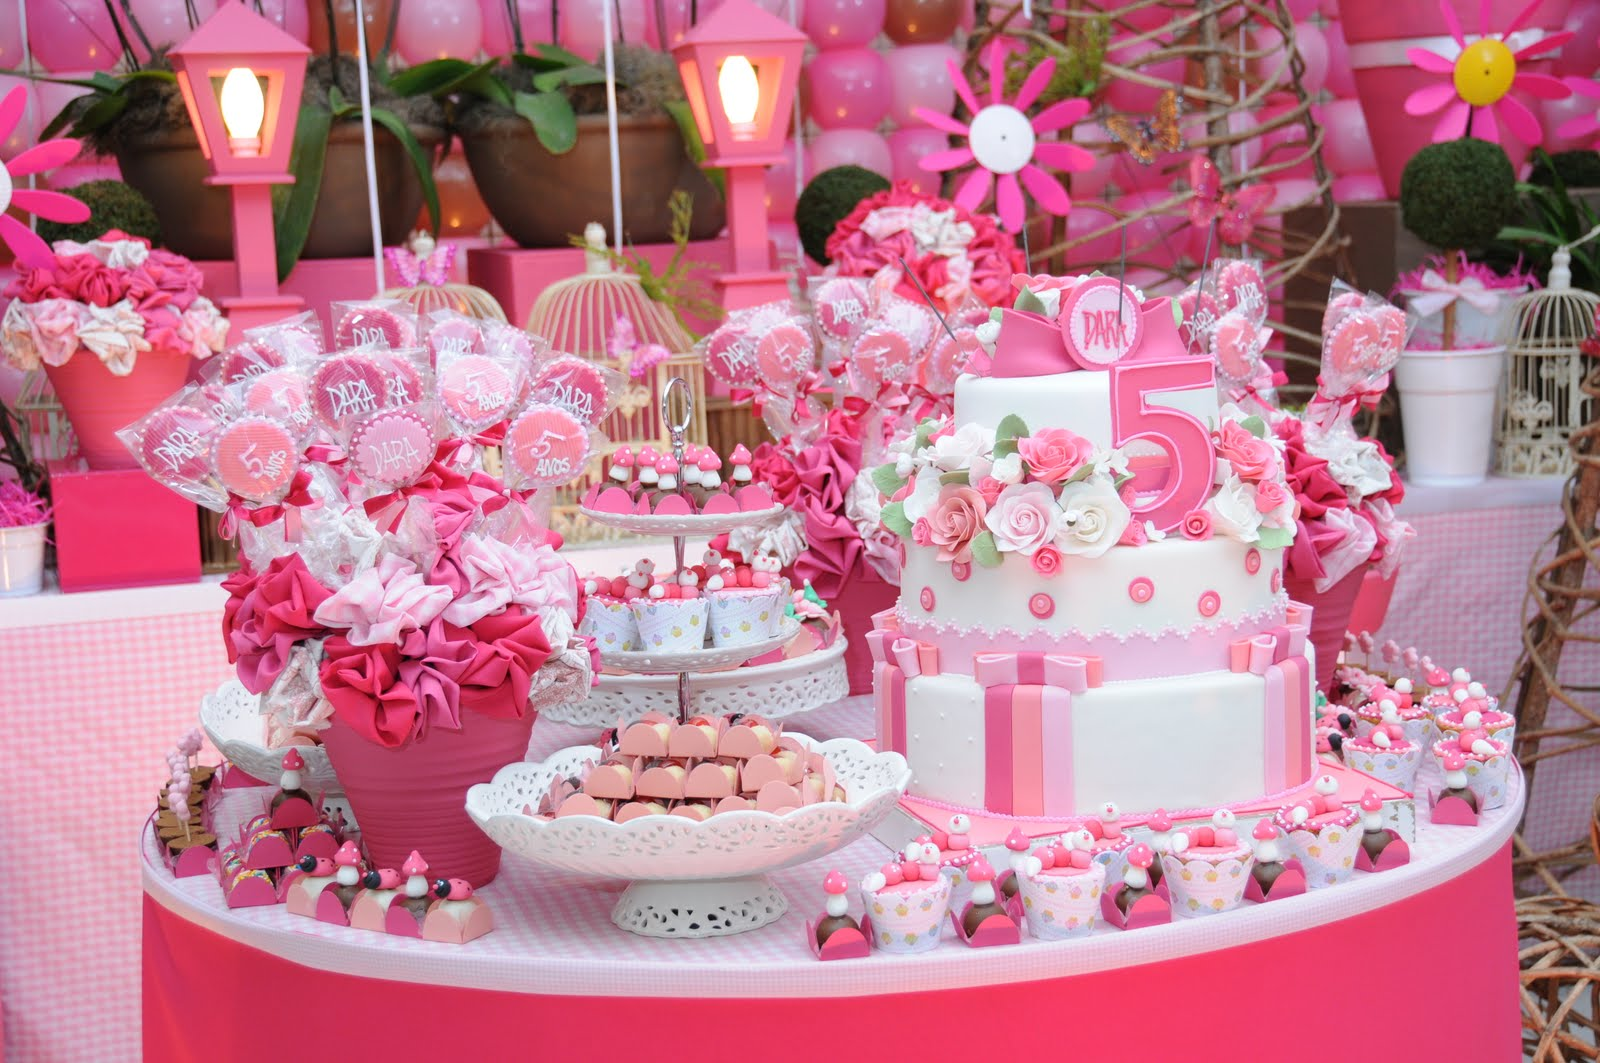 decoracao de festa infantil tema jardim:Aniversário infantil, tema Jardim, decoração Dois em Um Eventos